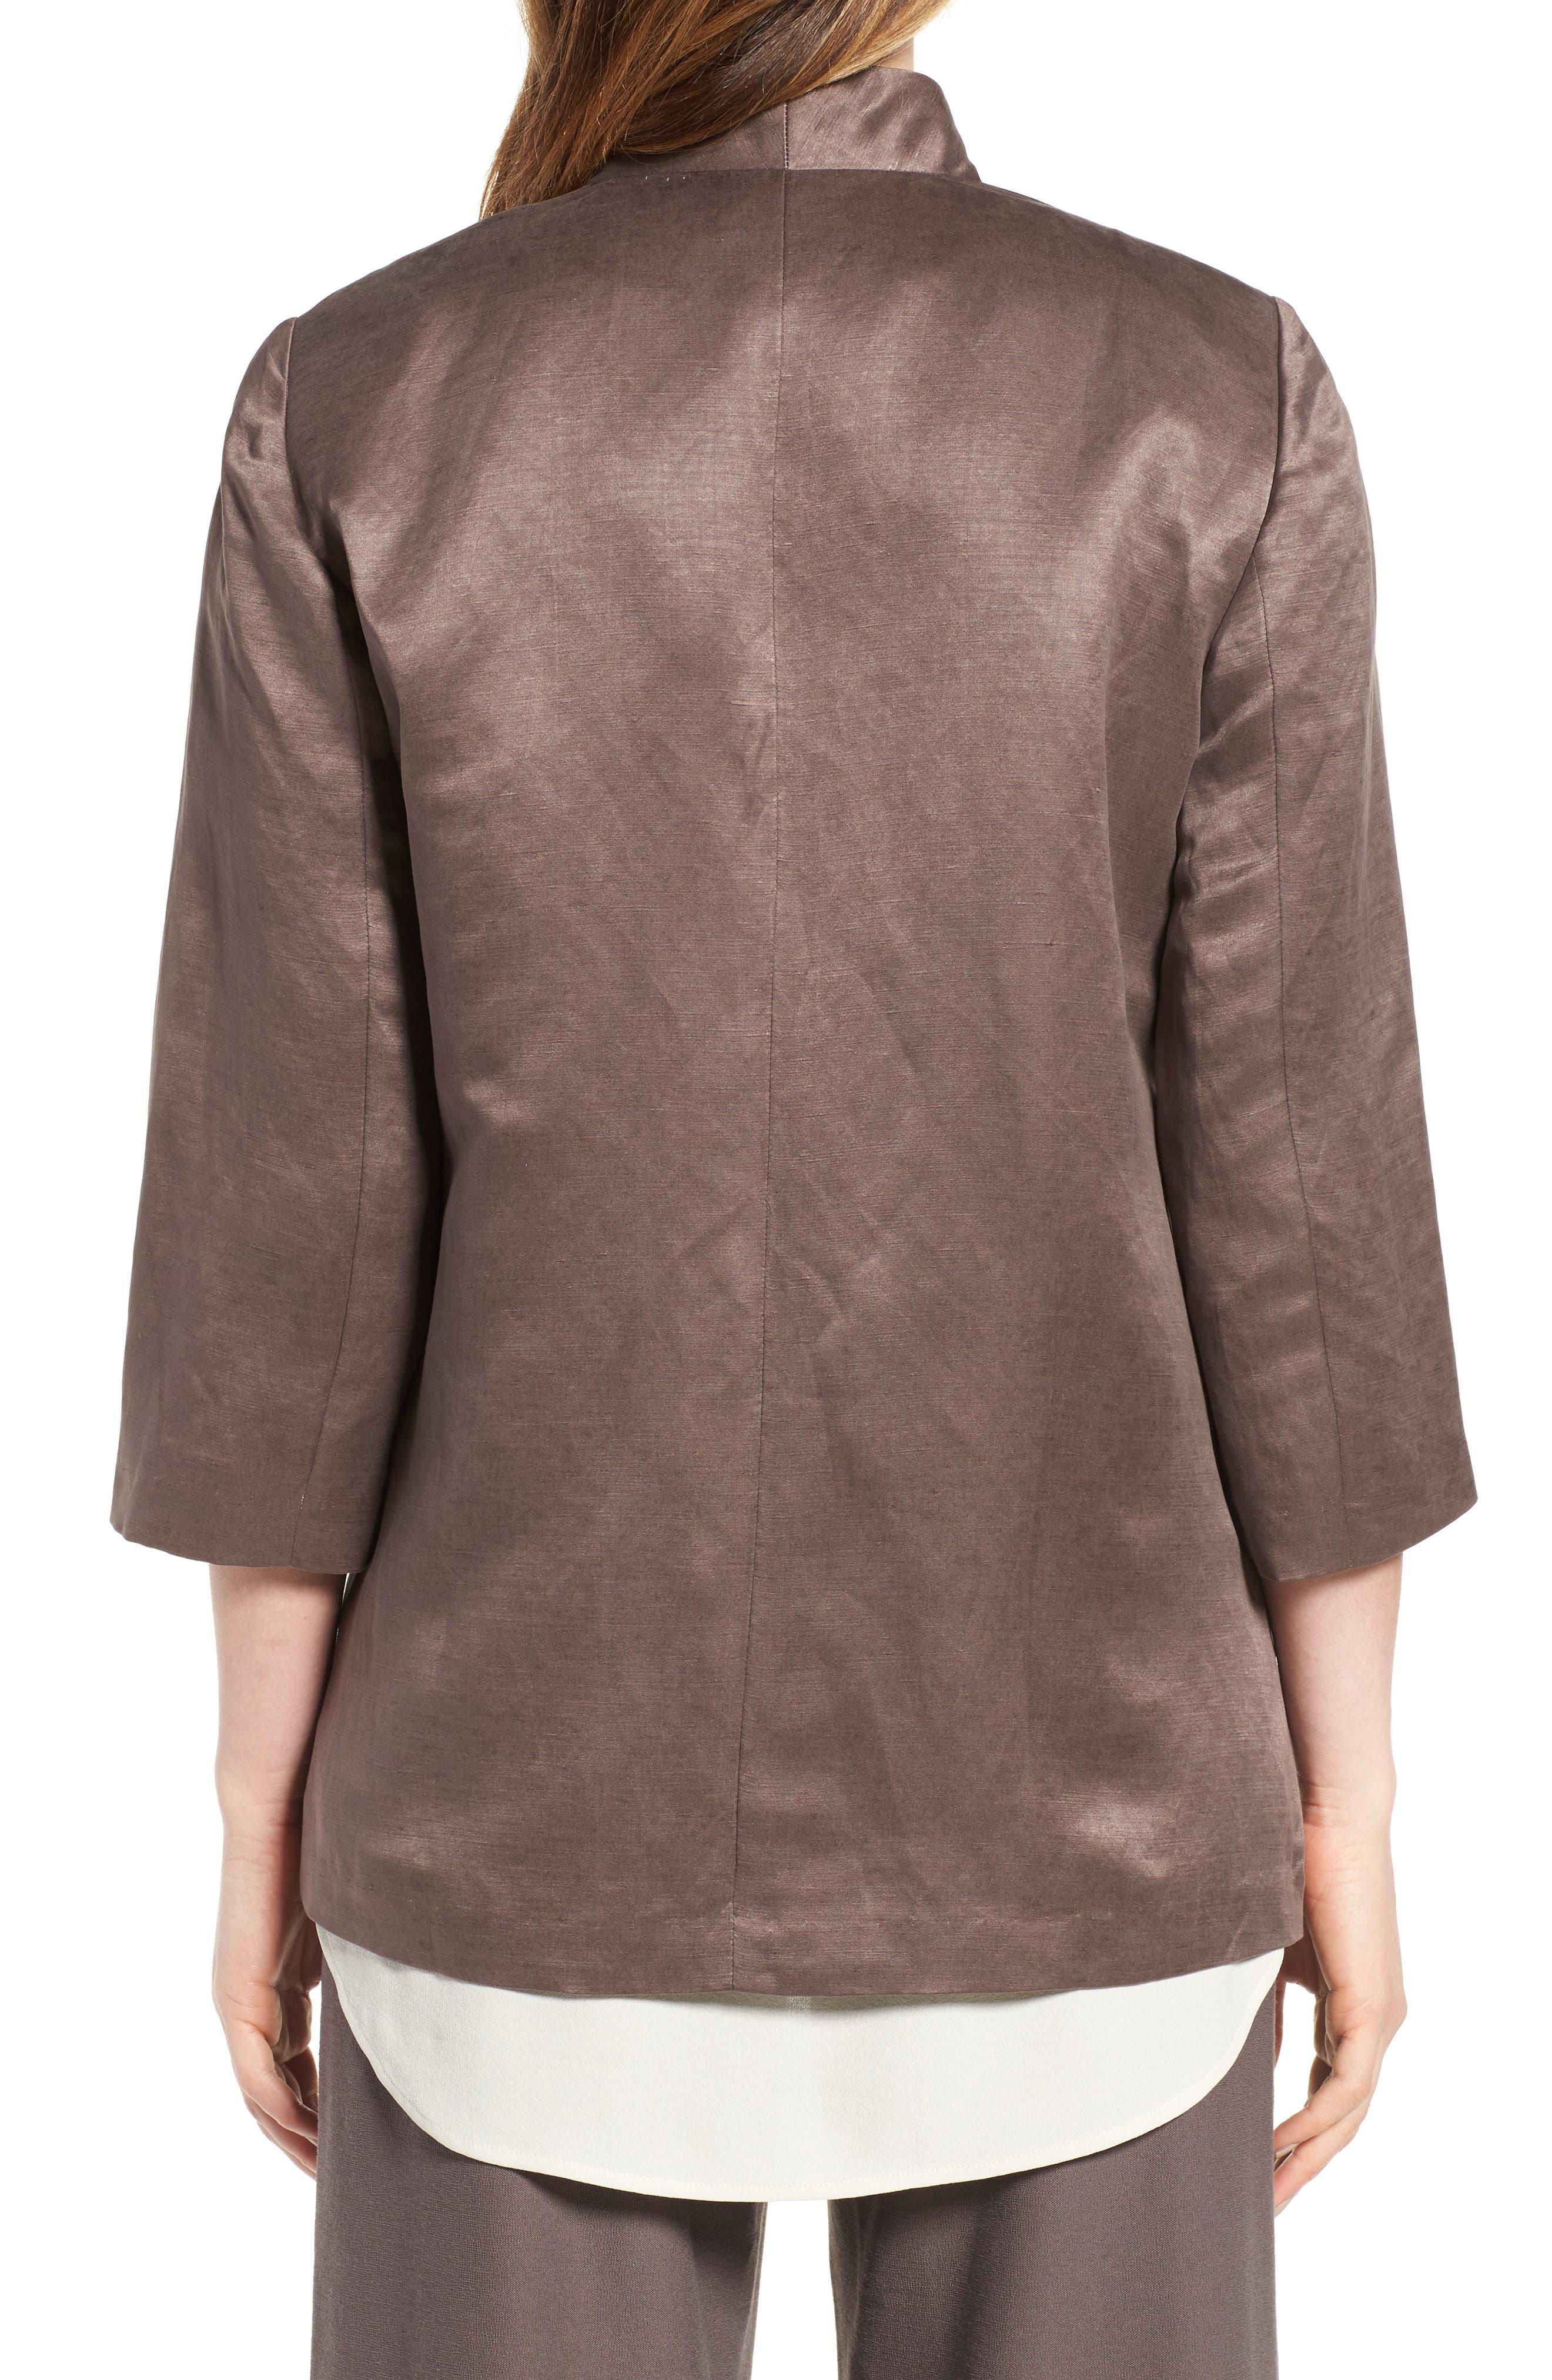 Organic Linen & Silk Jacket,                             Alternate thumbnail 2, color,                             200